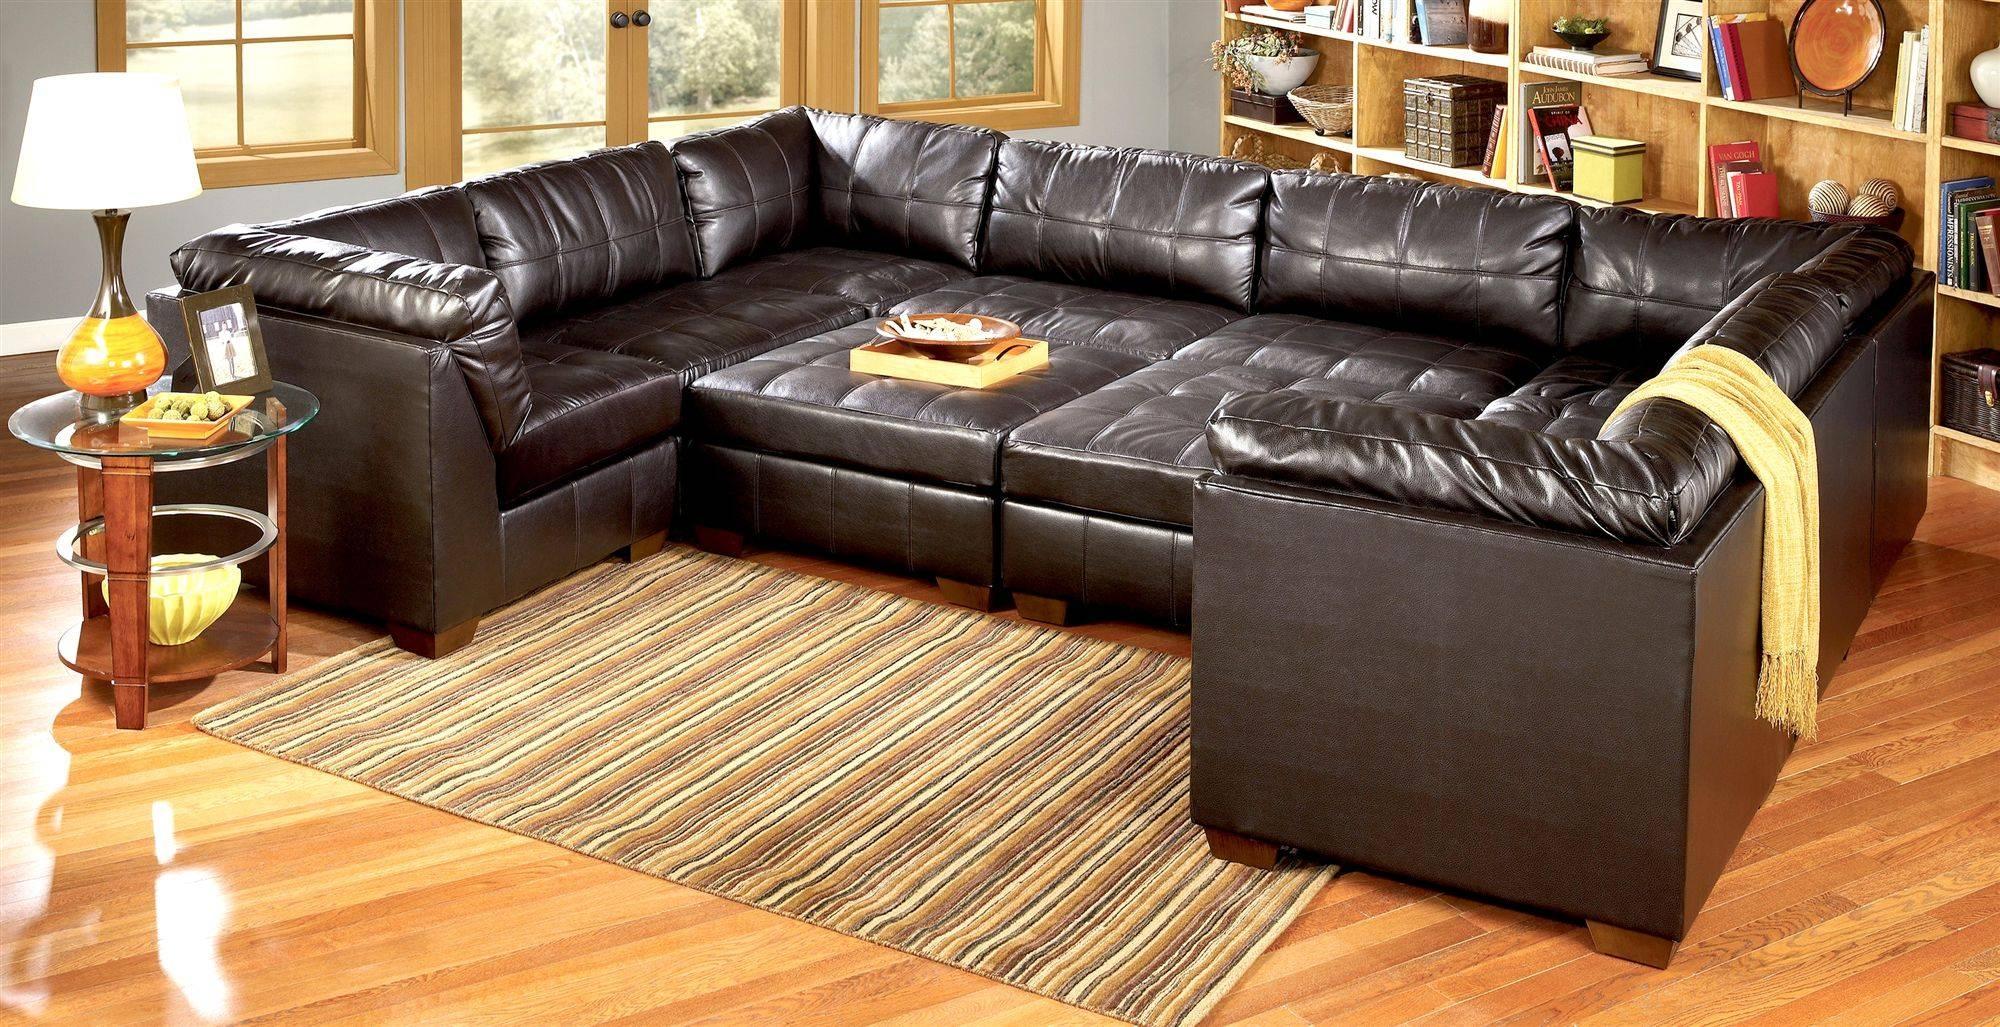 Ideal Modular Sectional Sofa Decor | Home Designjohn inside Sectinal Sofas (Image 13 of 30)